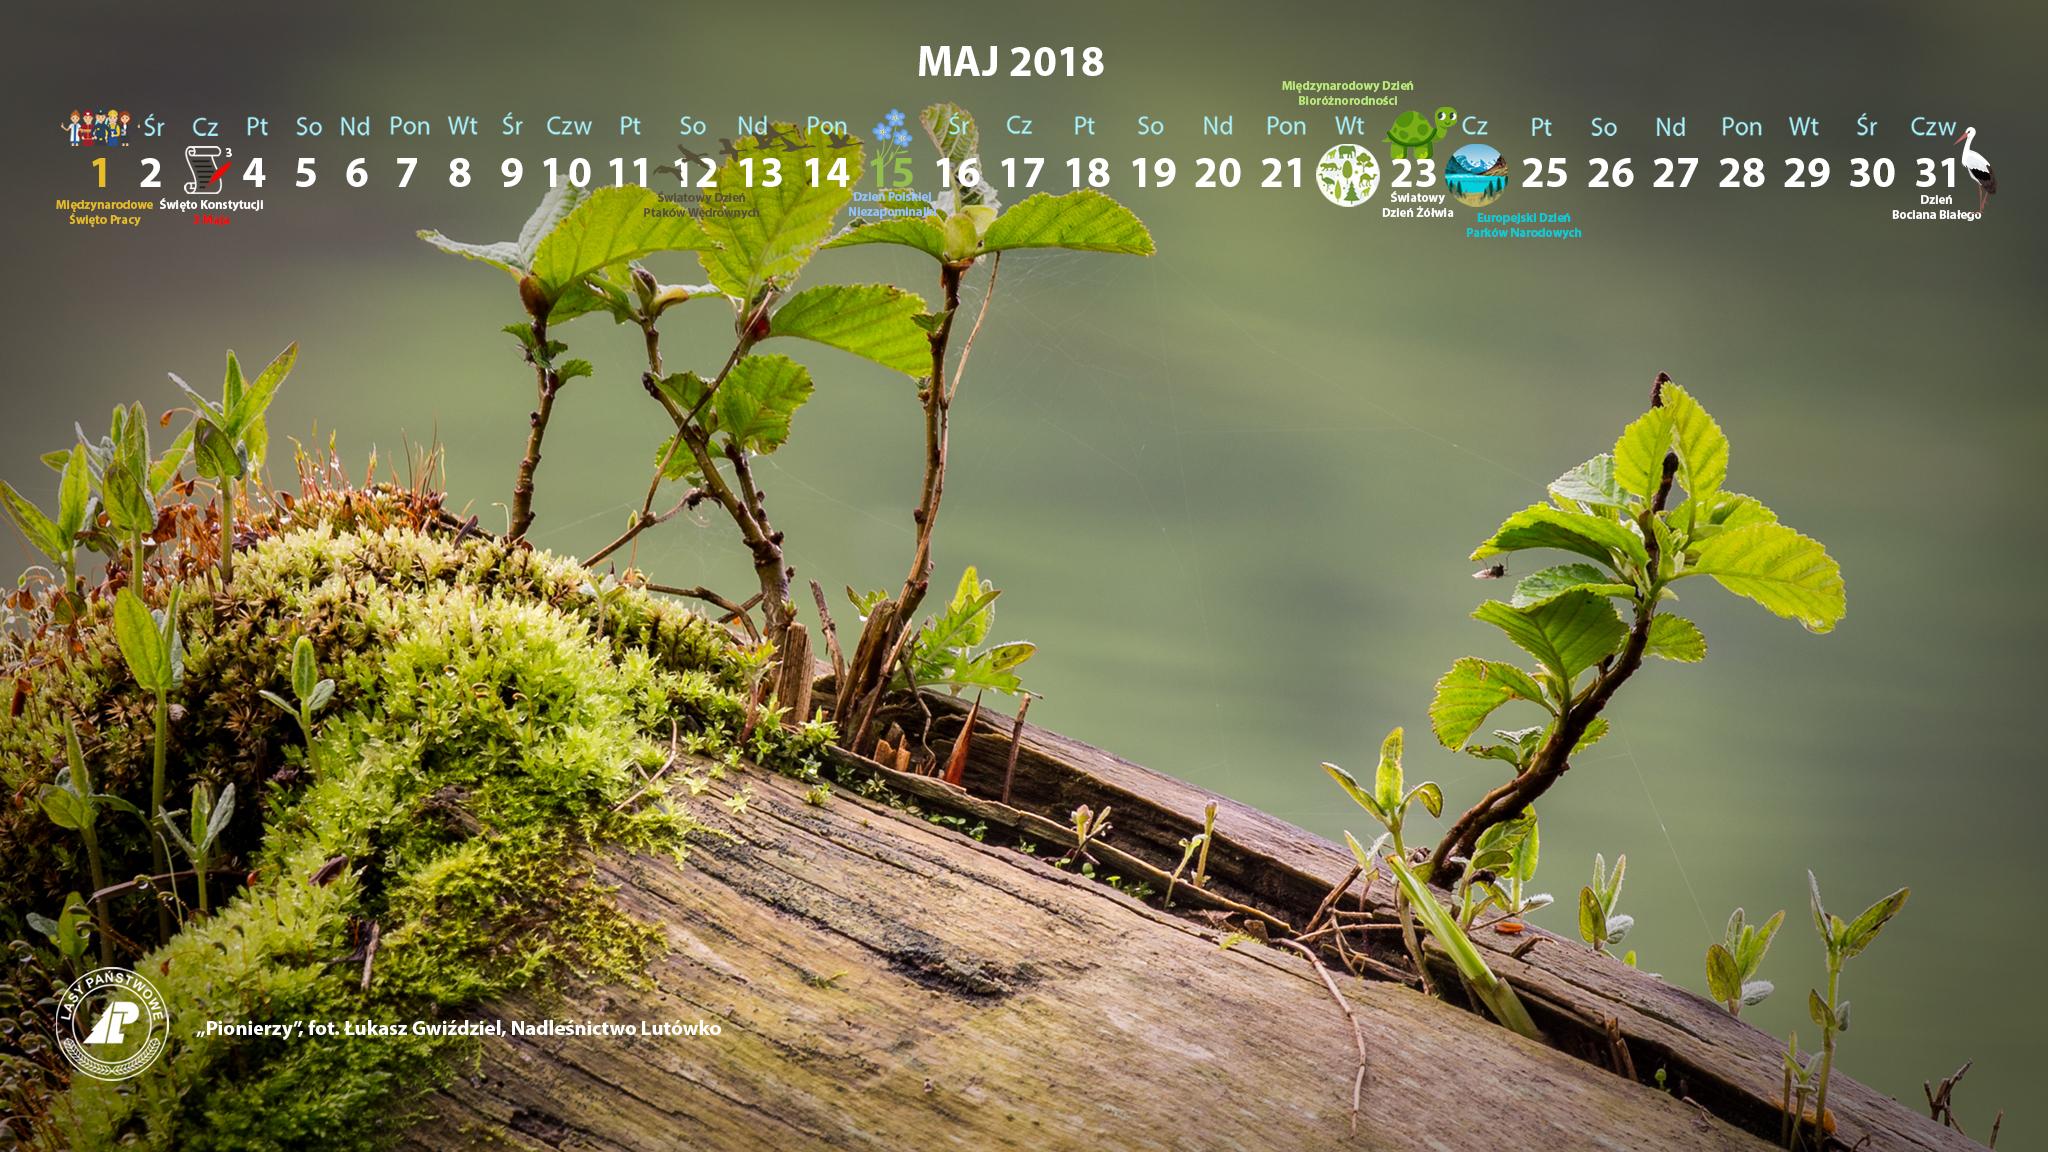 Kalendarz maj 2018 2048x1152.jpg